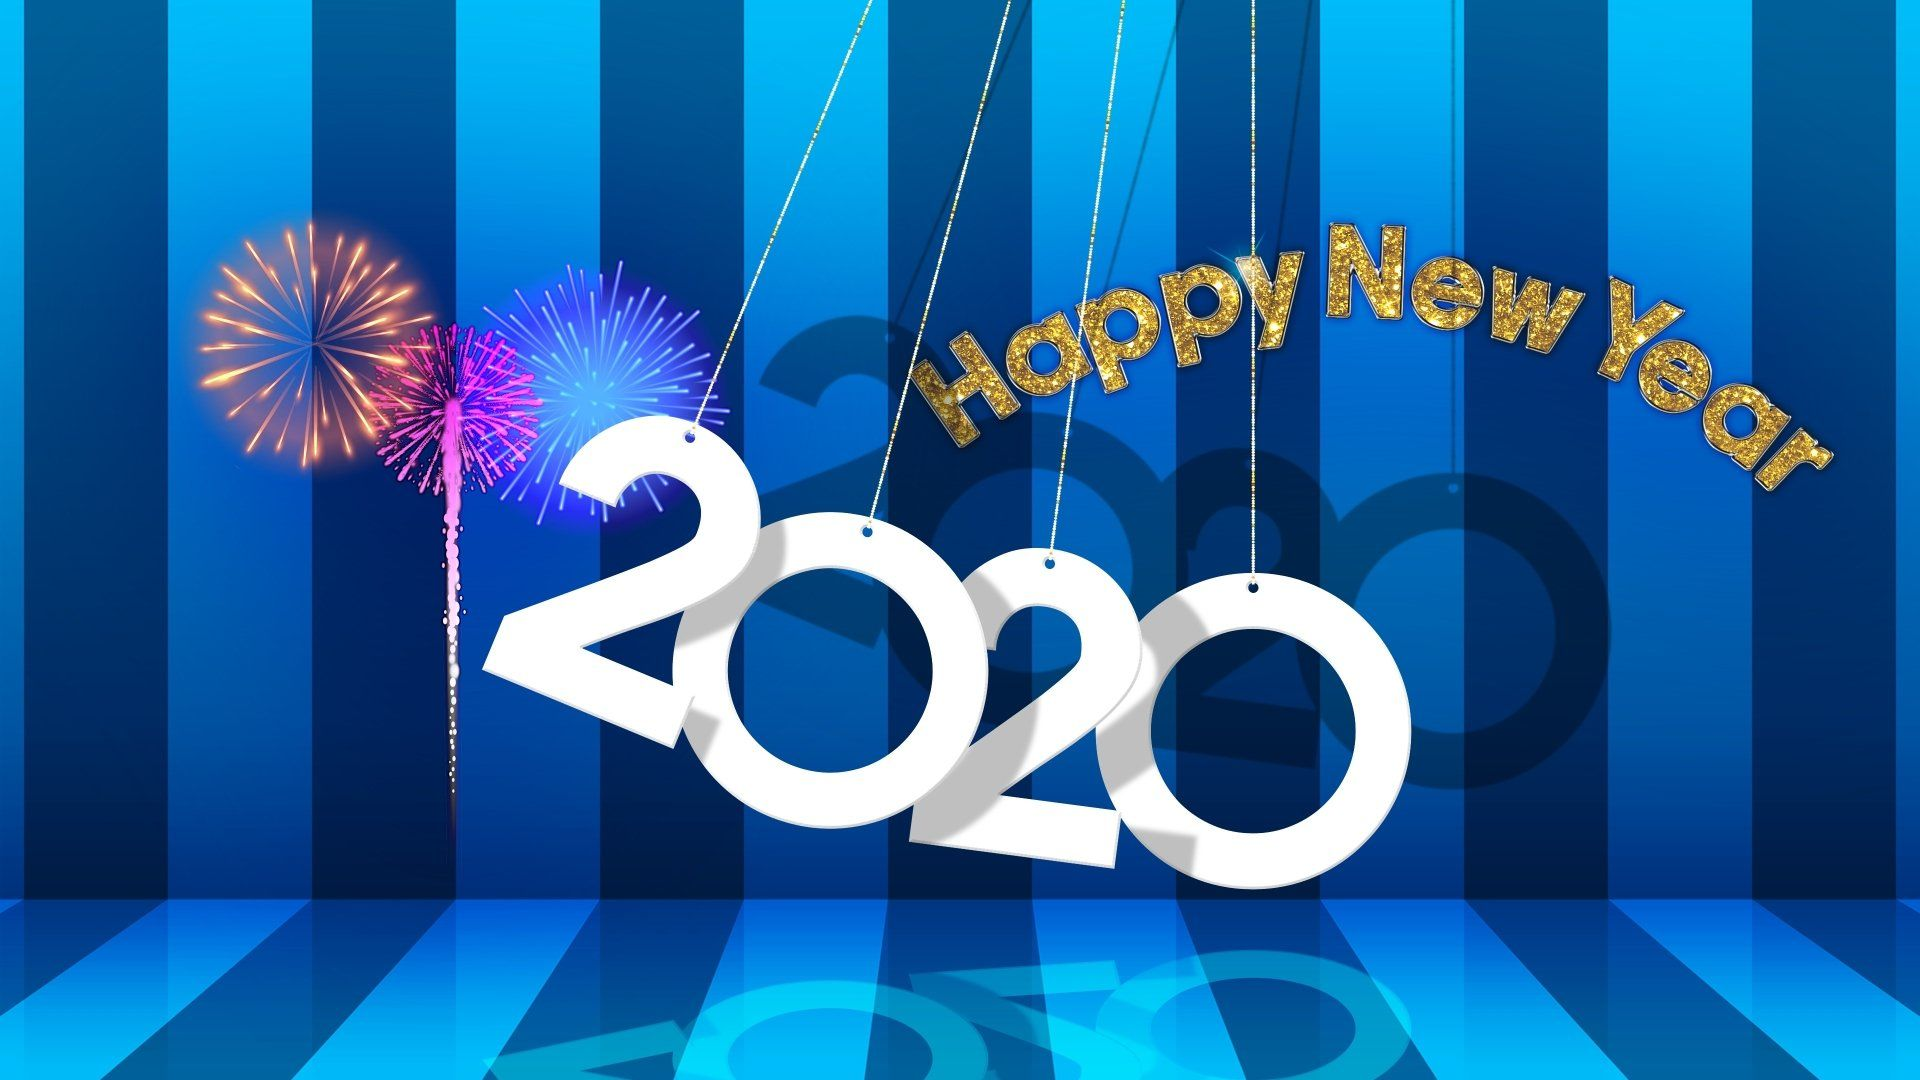 2020 New Year HD Wallpaper